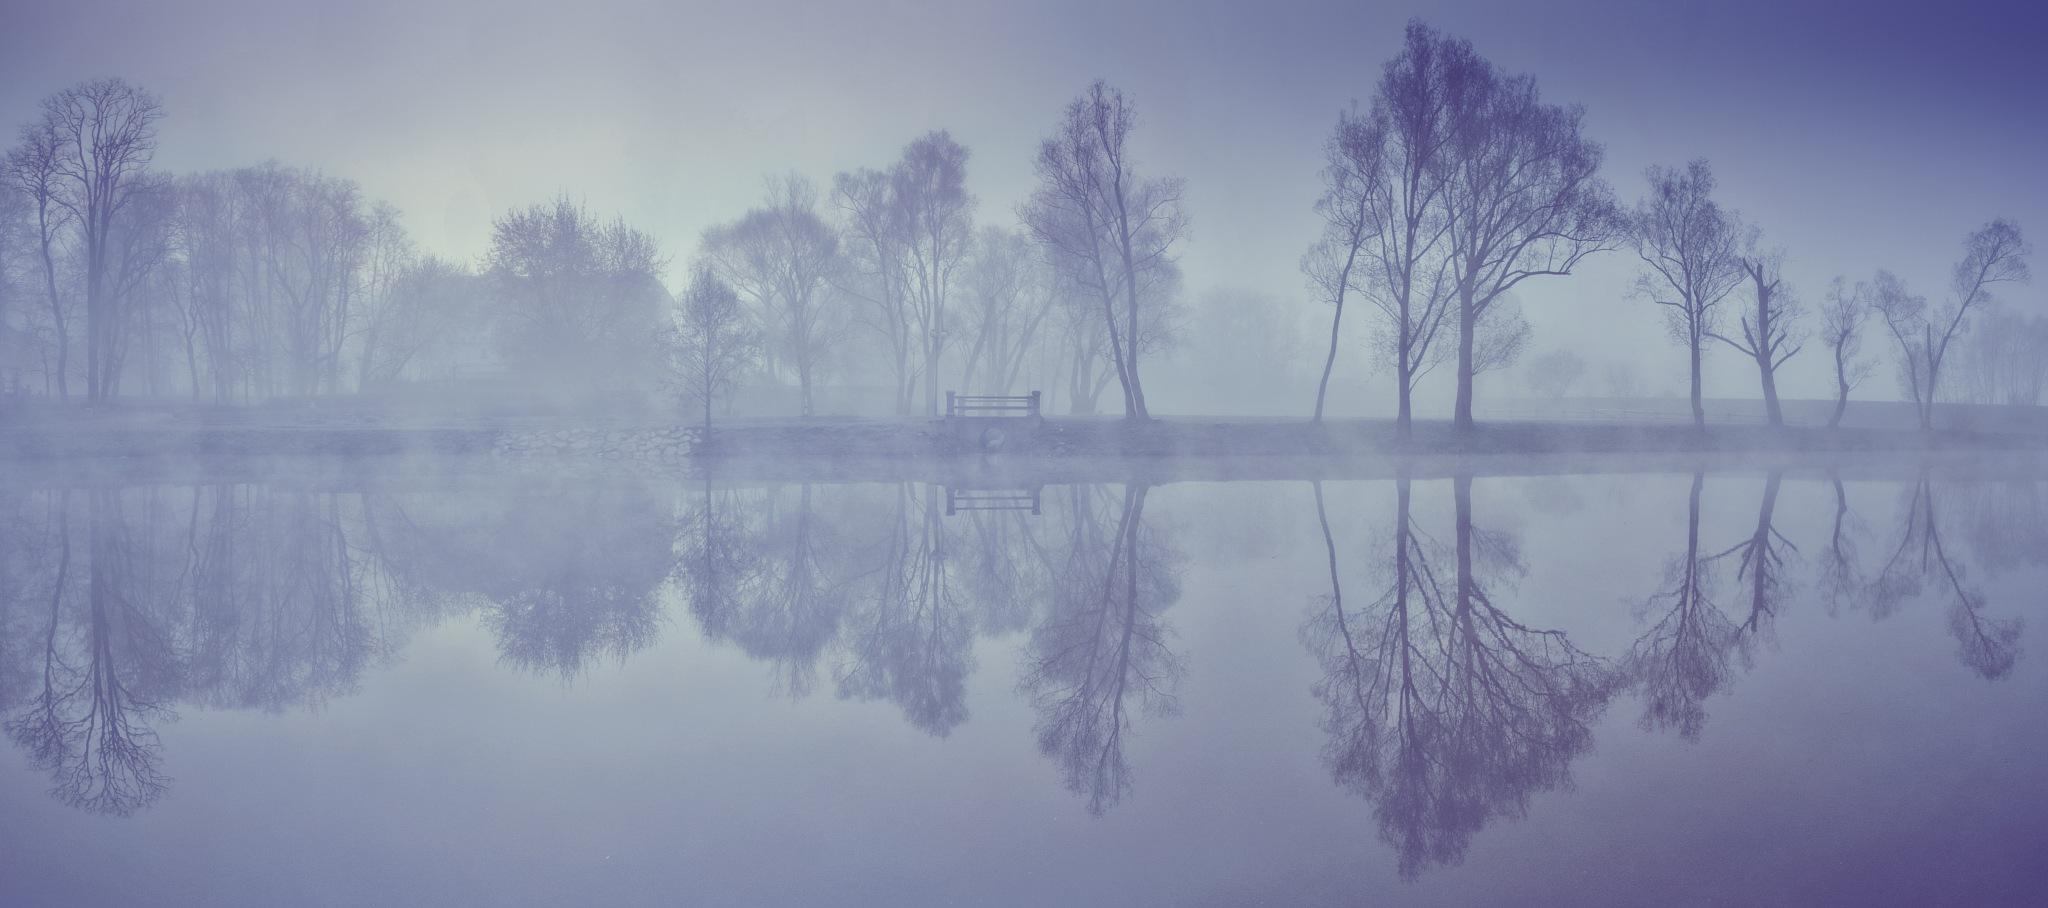 help me dreaming here by Marcin Majkowski